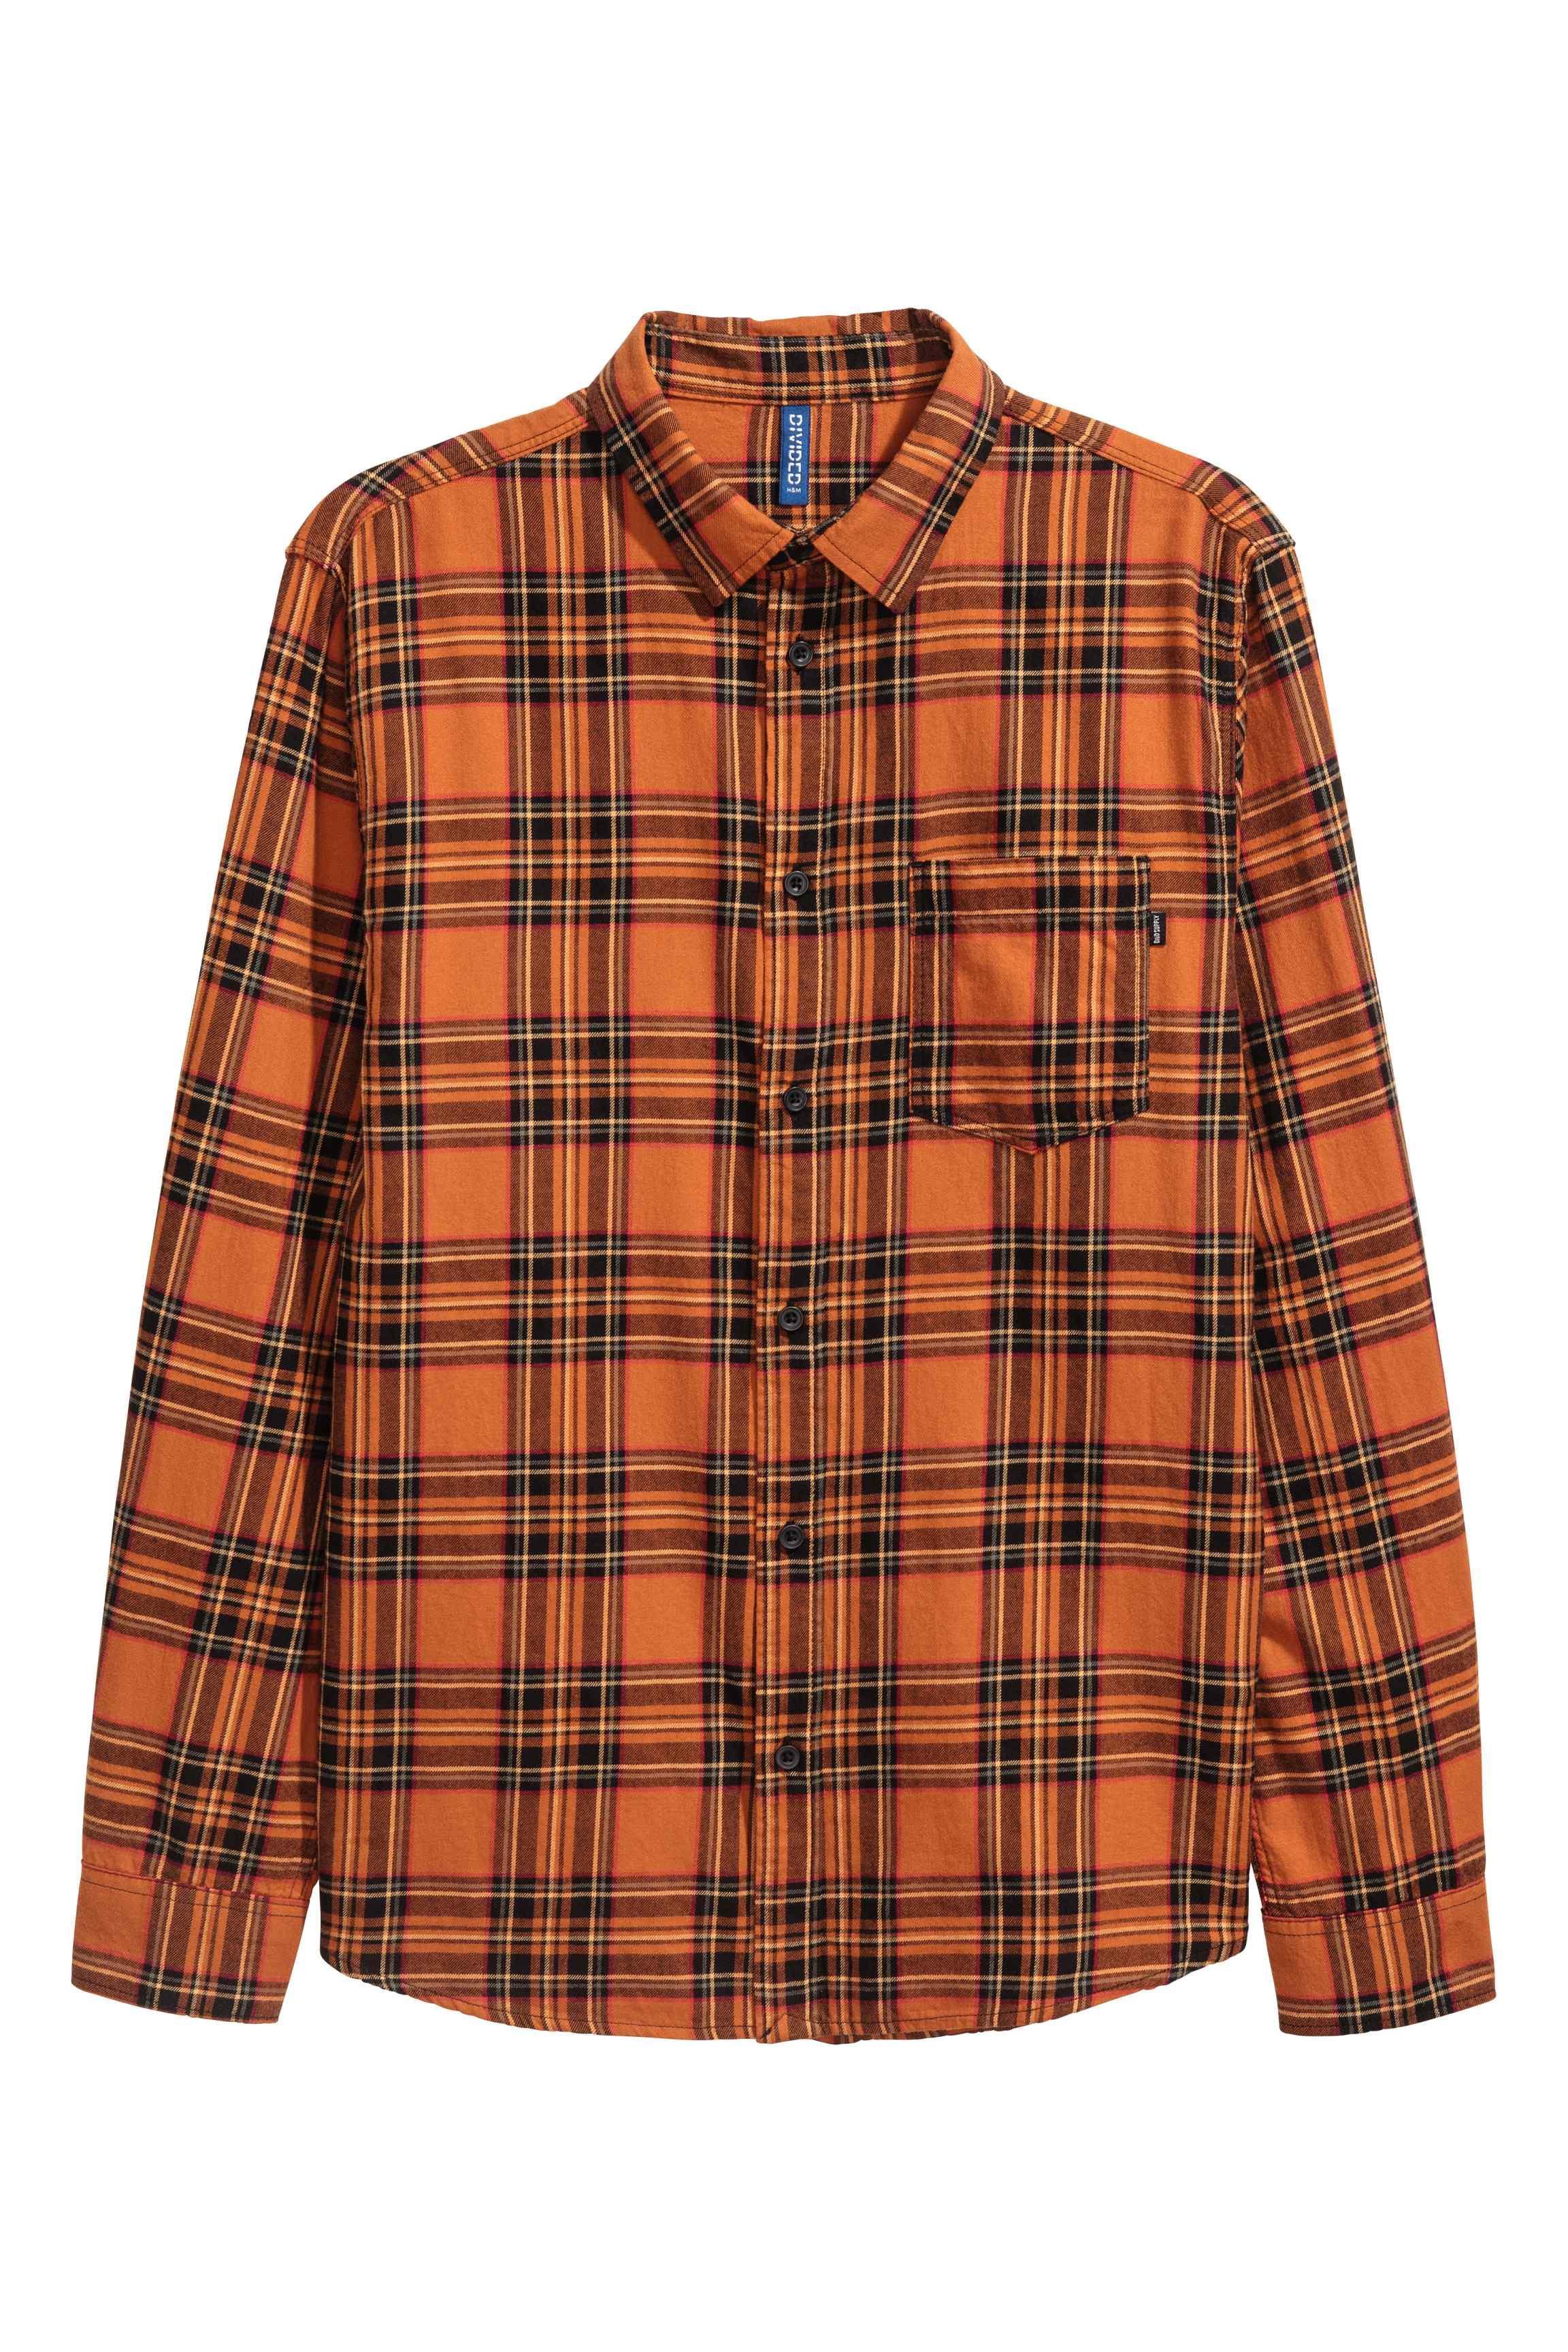 H&m Checked Flannel Shirt in Orange for Men | Lyst